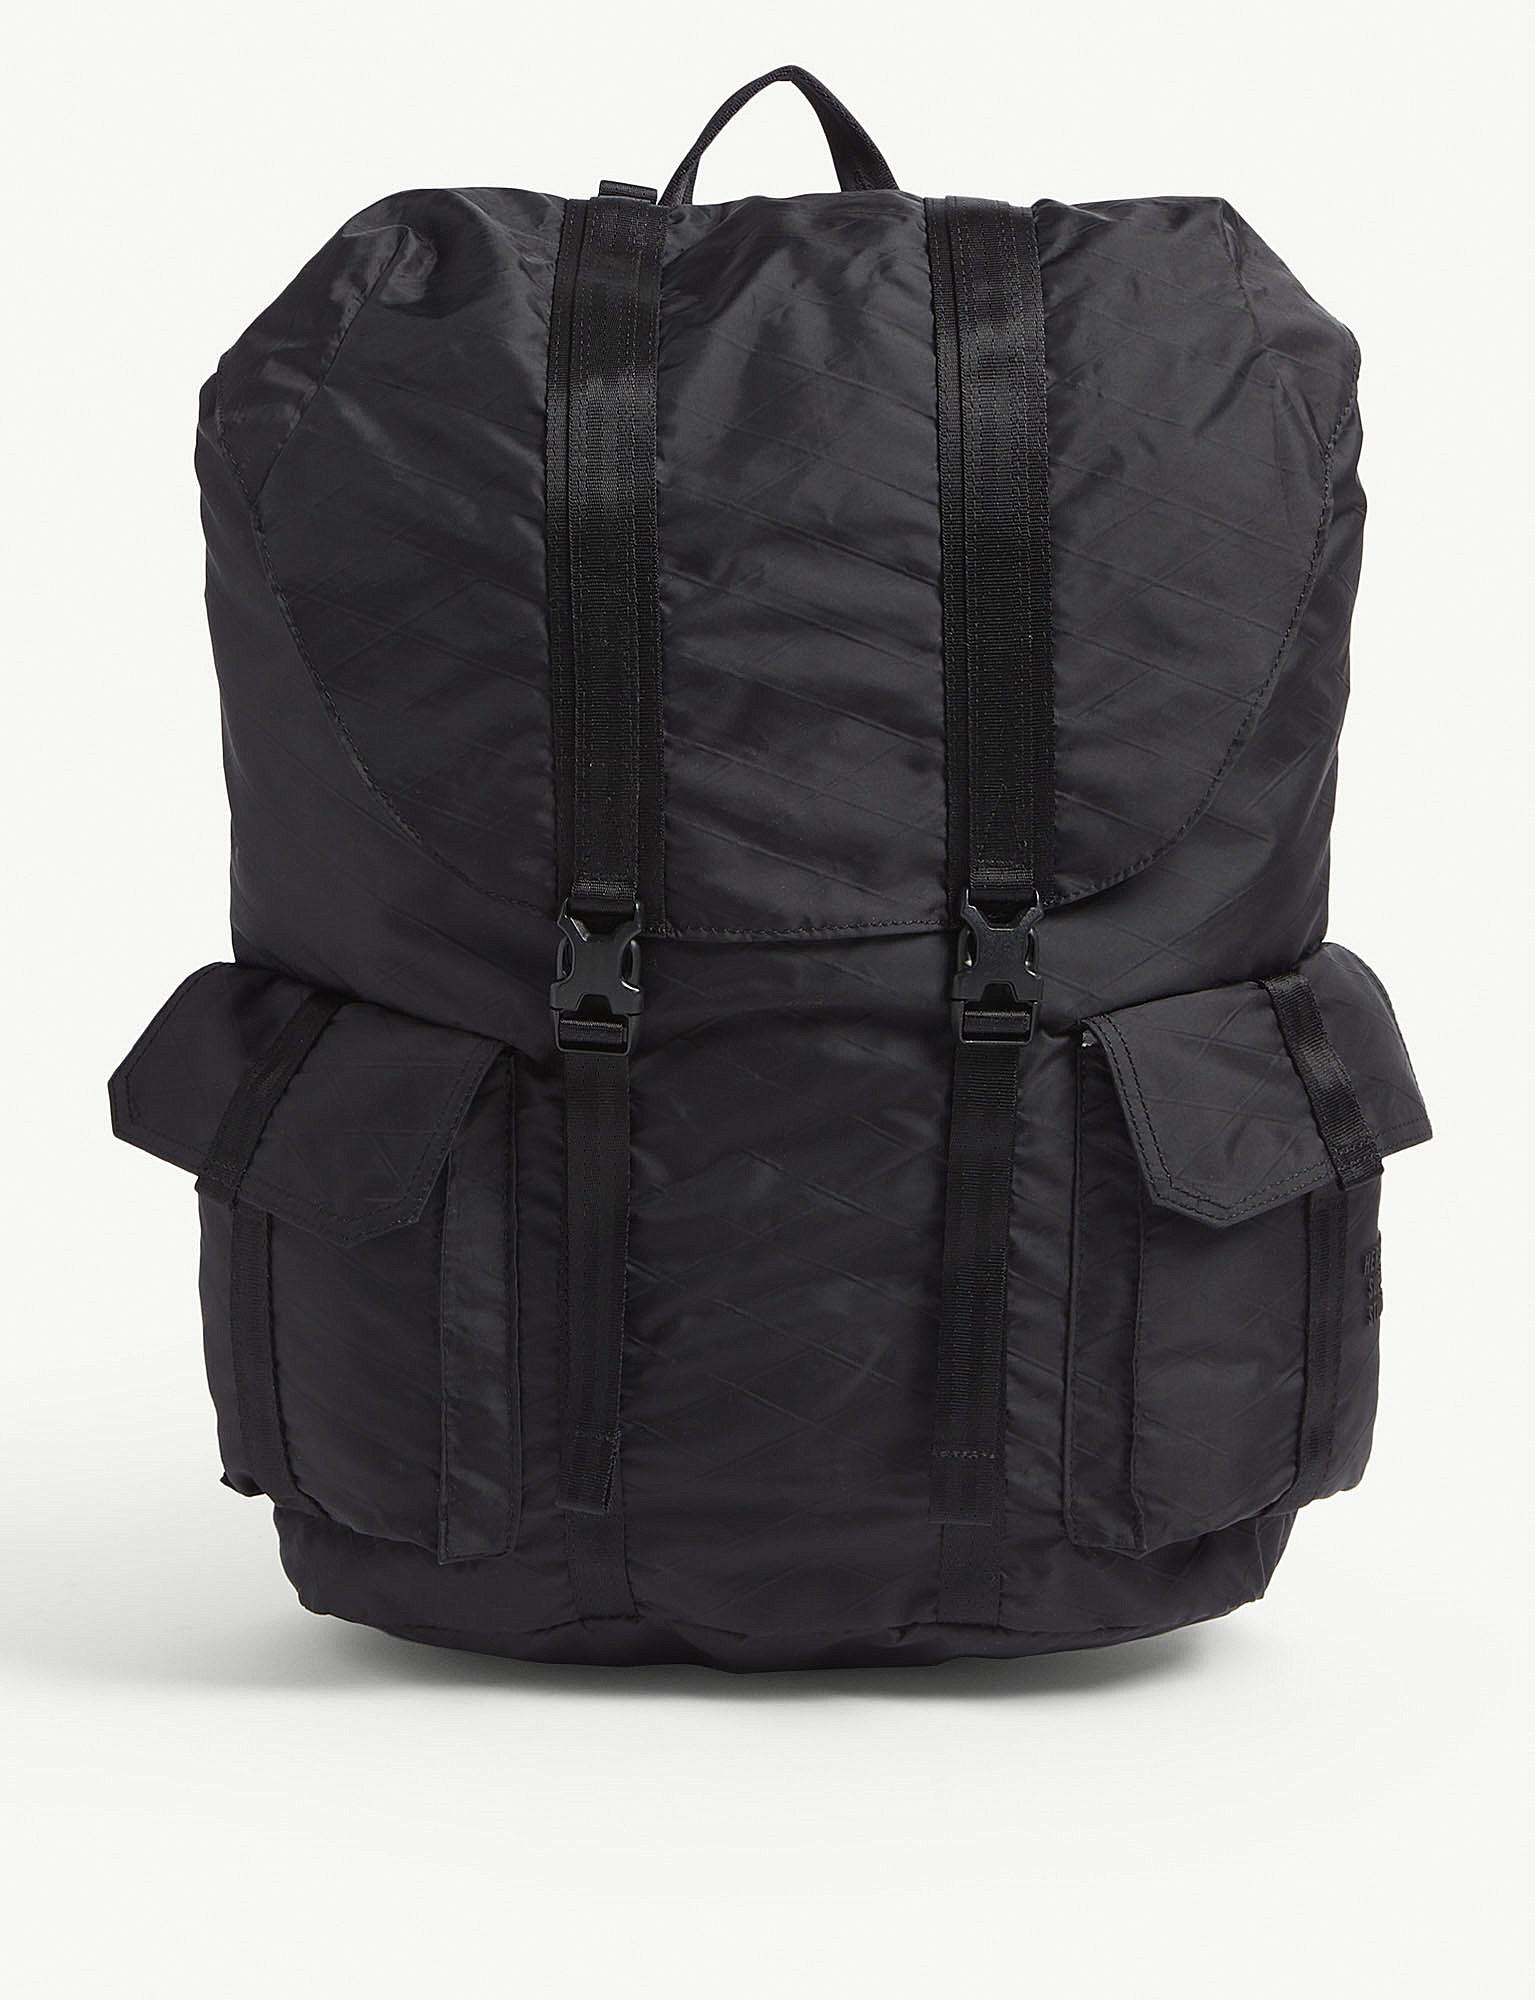 75124961a4a Herschel Supply Co. Studio Dawson Xl Backpack in Black for Men - Lyst